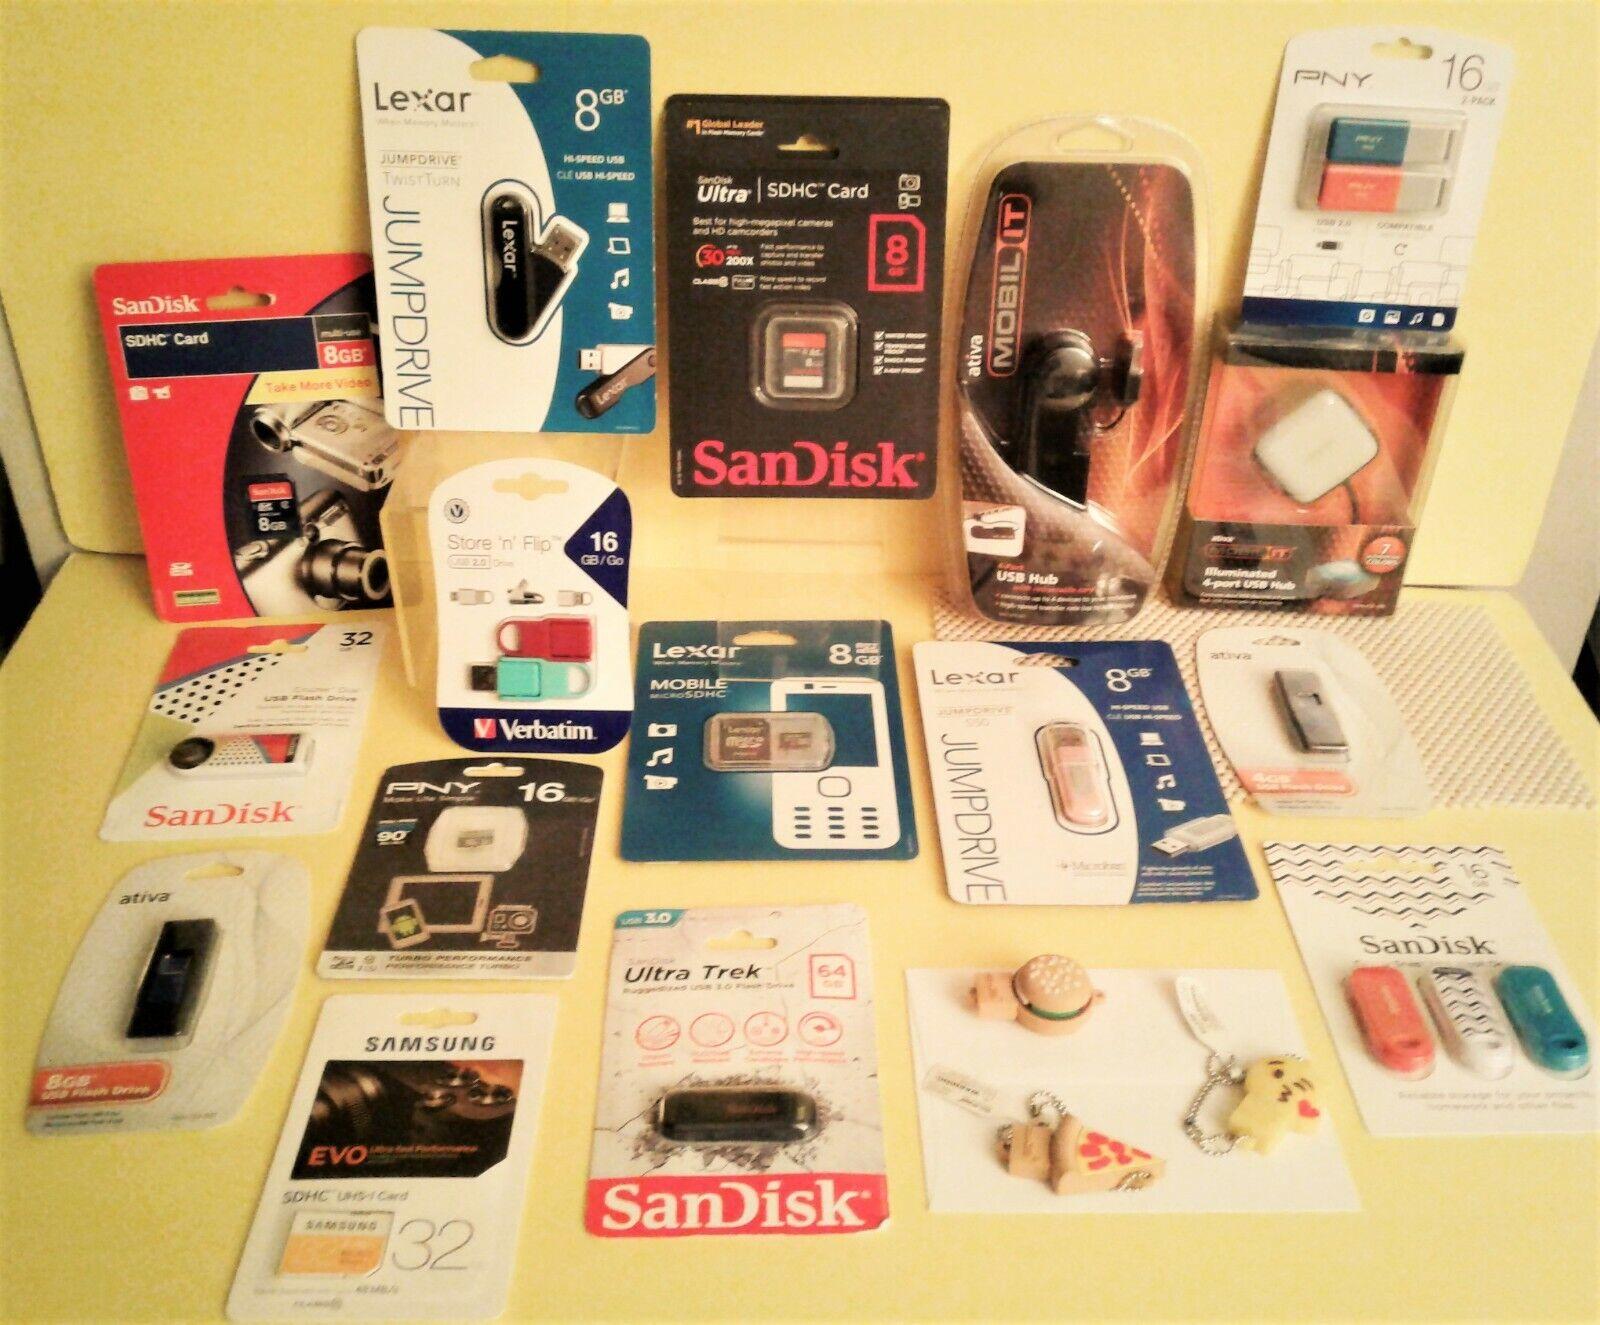 Flash Jump Twist Thumb Drives, Memory Cards, Micro SDHC 7-Li